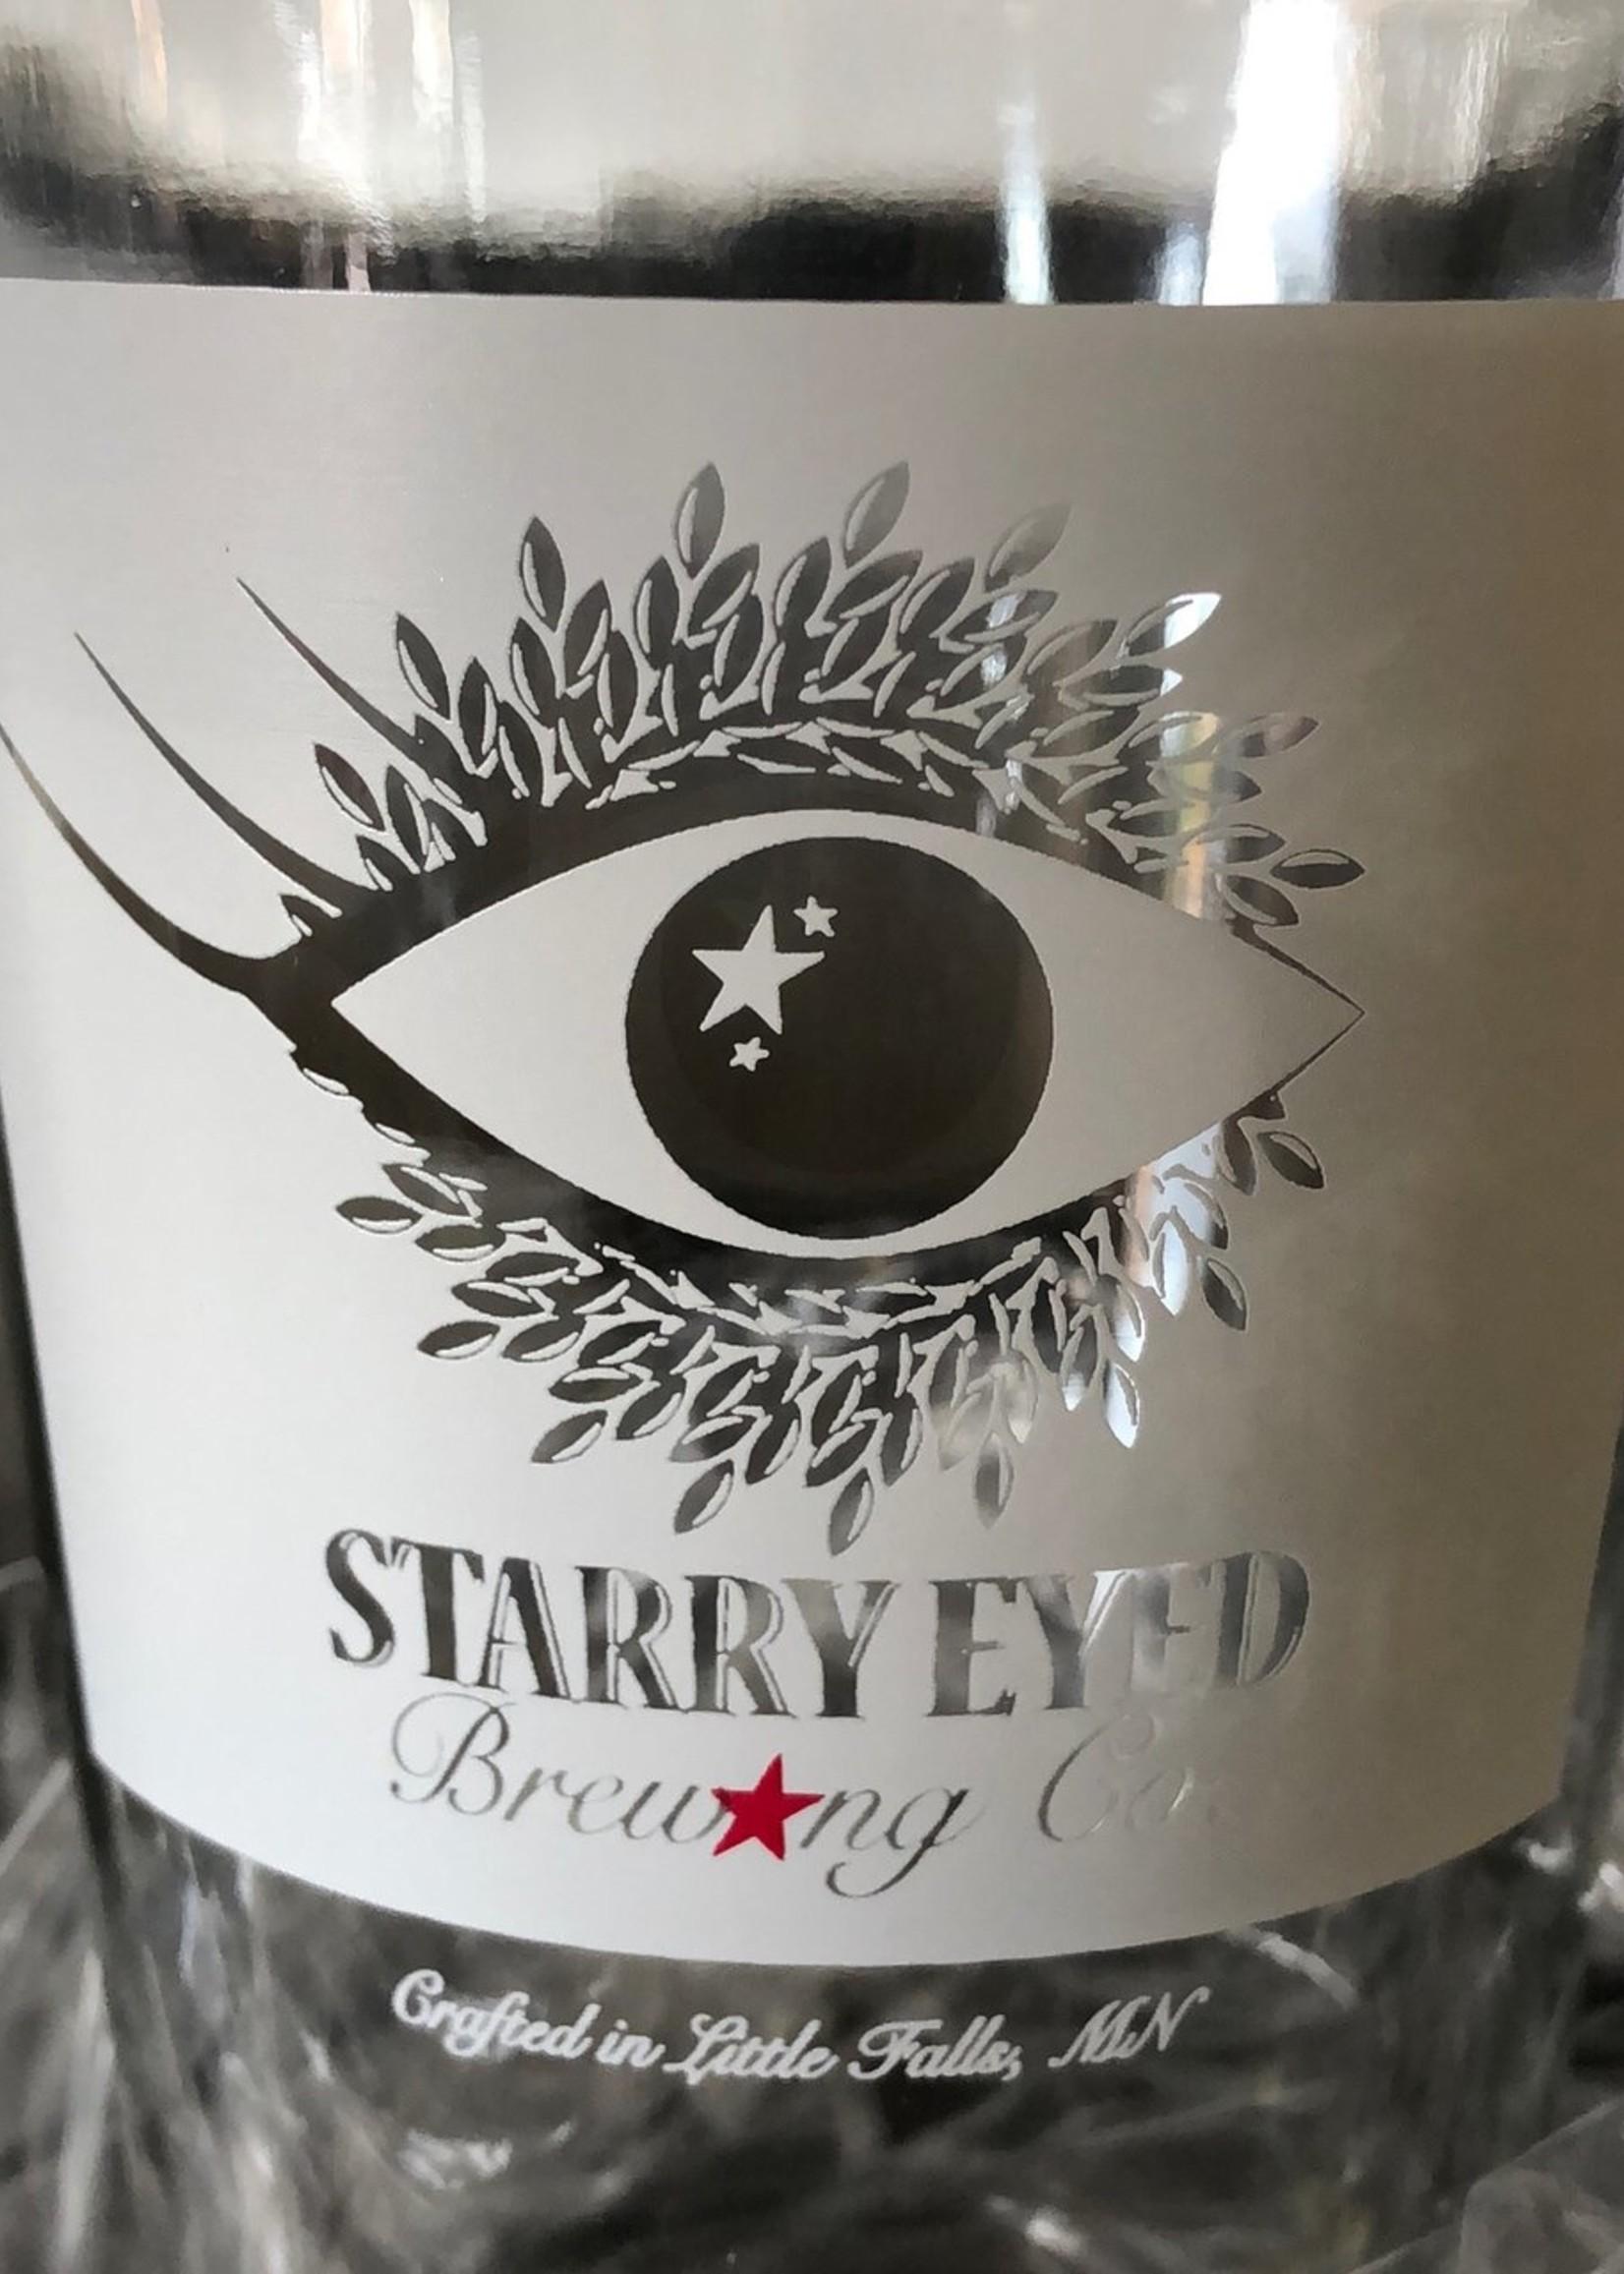 Starry Eyed Amber Ale - 4x12oz Bottles